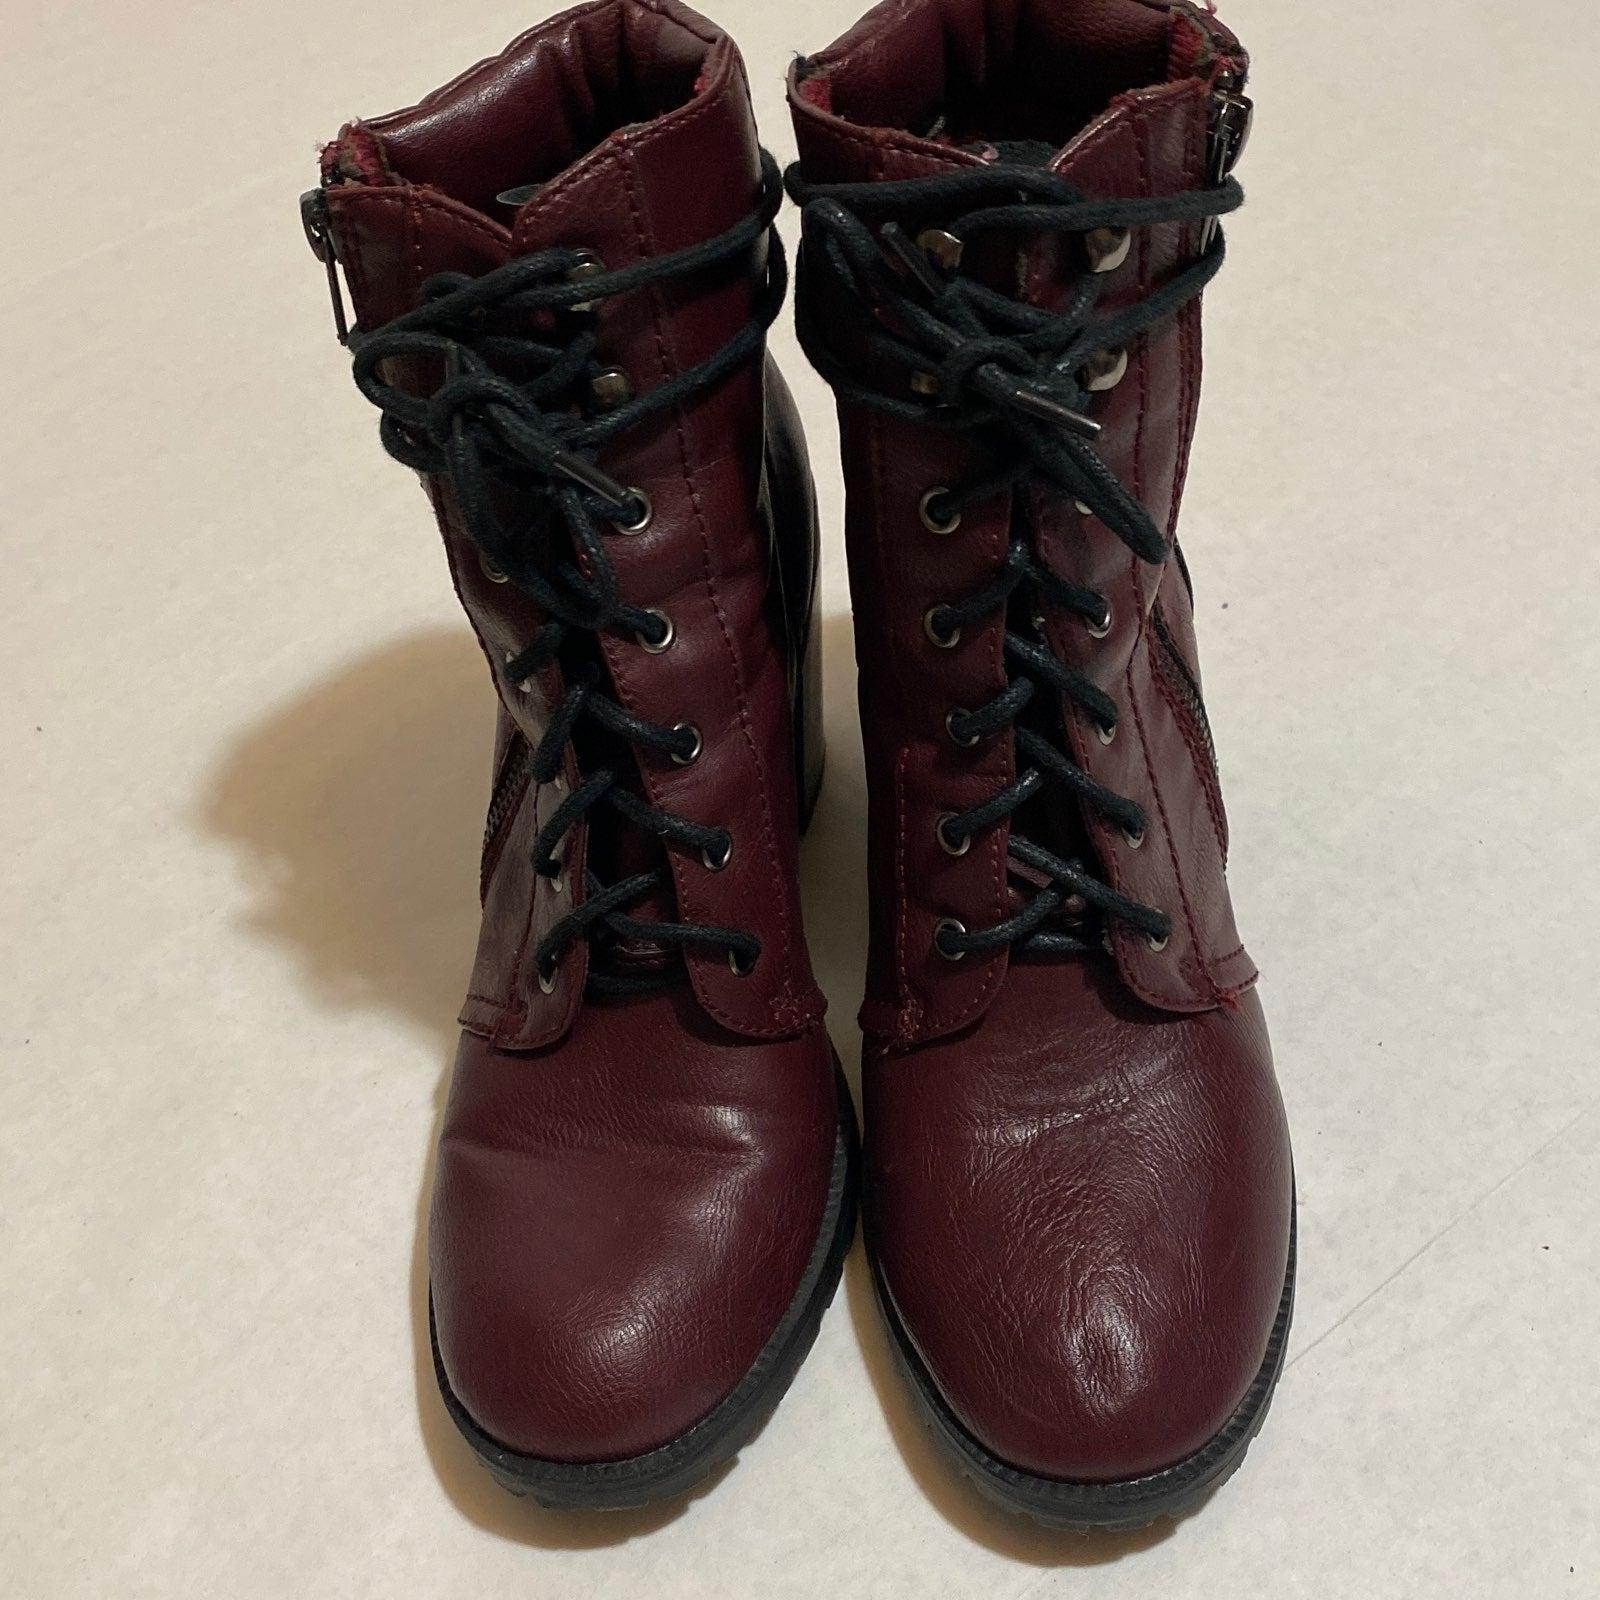 Justfab Darma burgandy combat boots